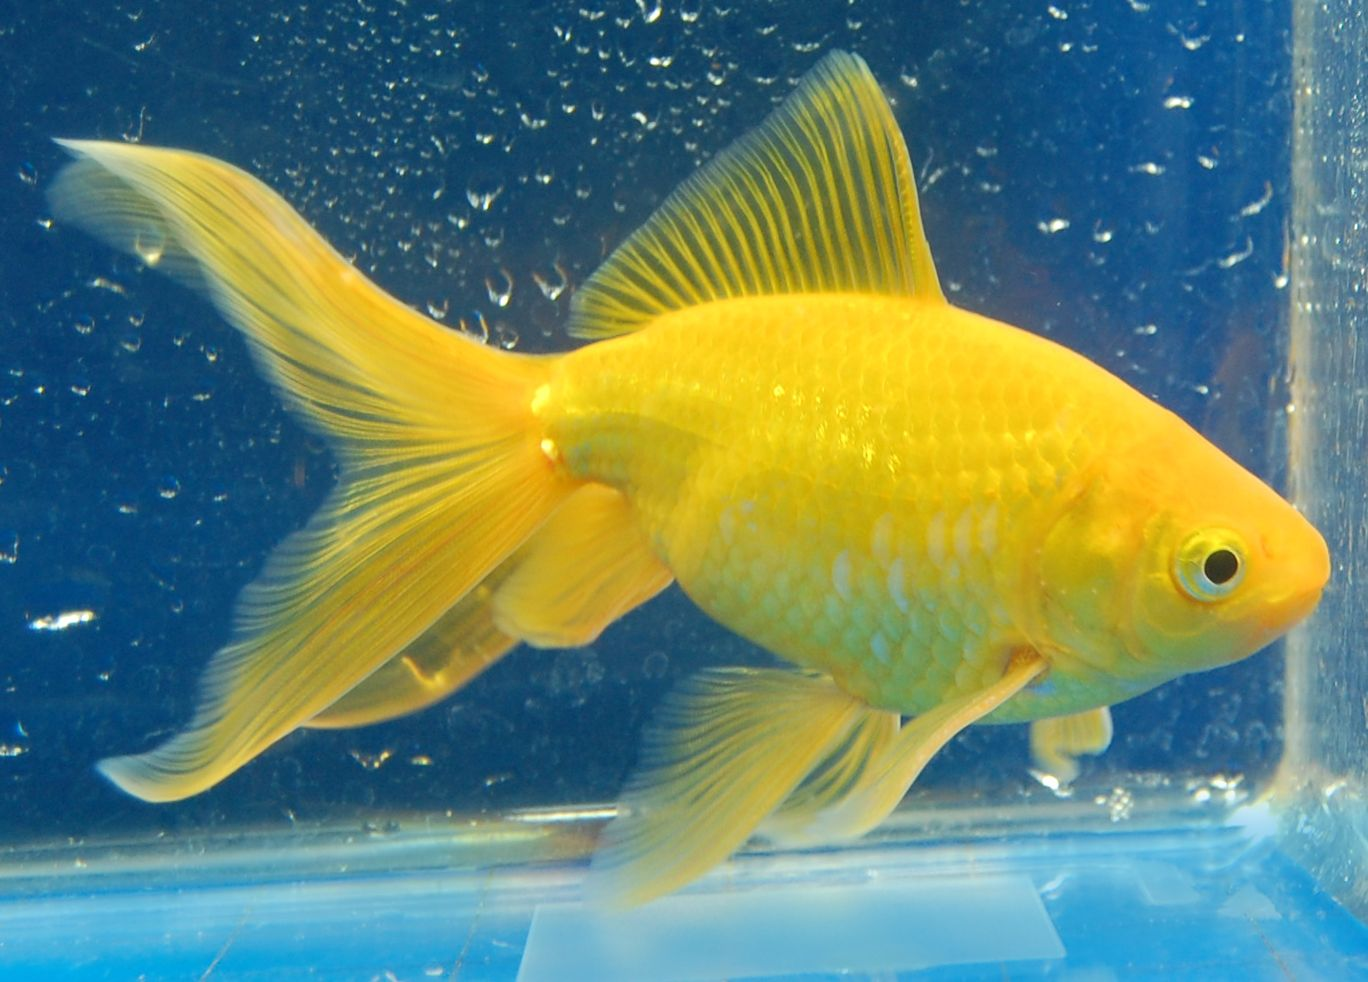 Watonai From Rain Garden Goldfish Would Love Saki Hikari Fancy Goldfish Www Hikariusa Com Goldfish Goldfish Pond Freshwater Aquarium Fish